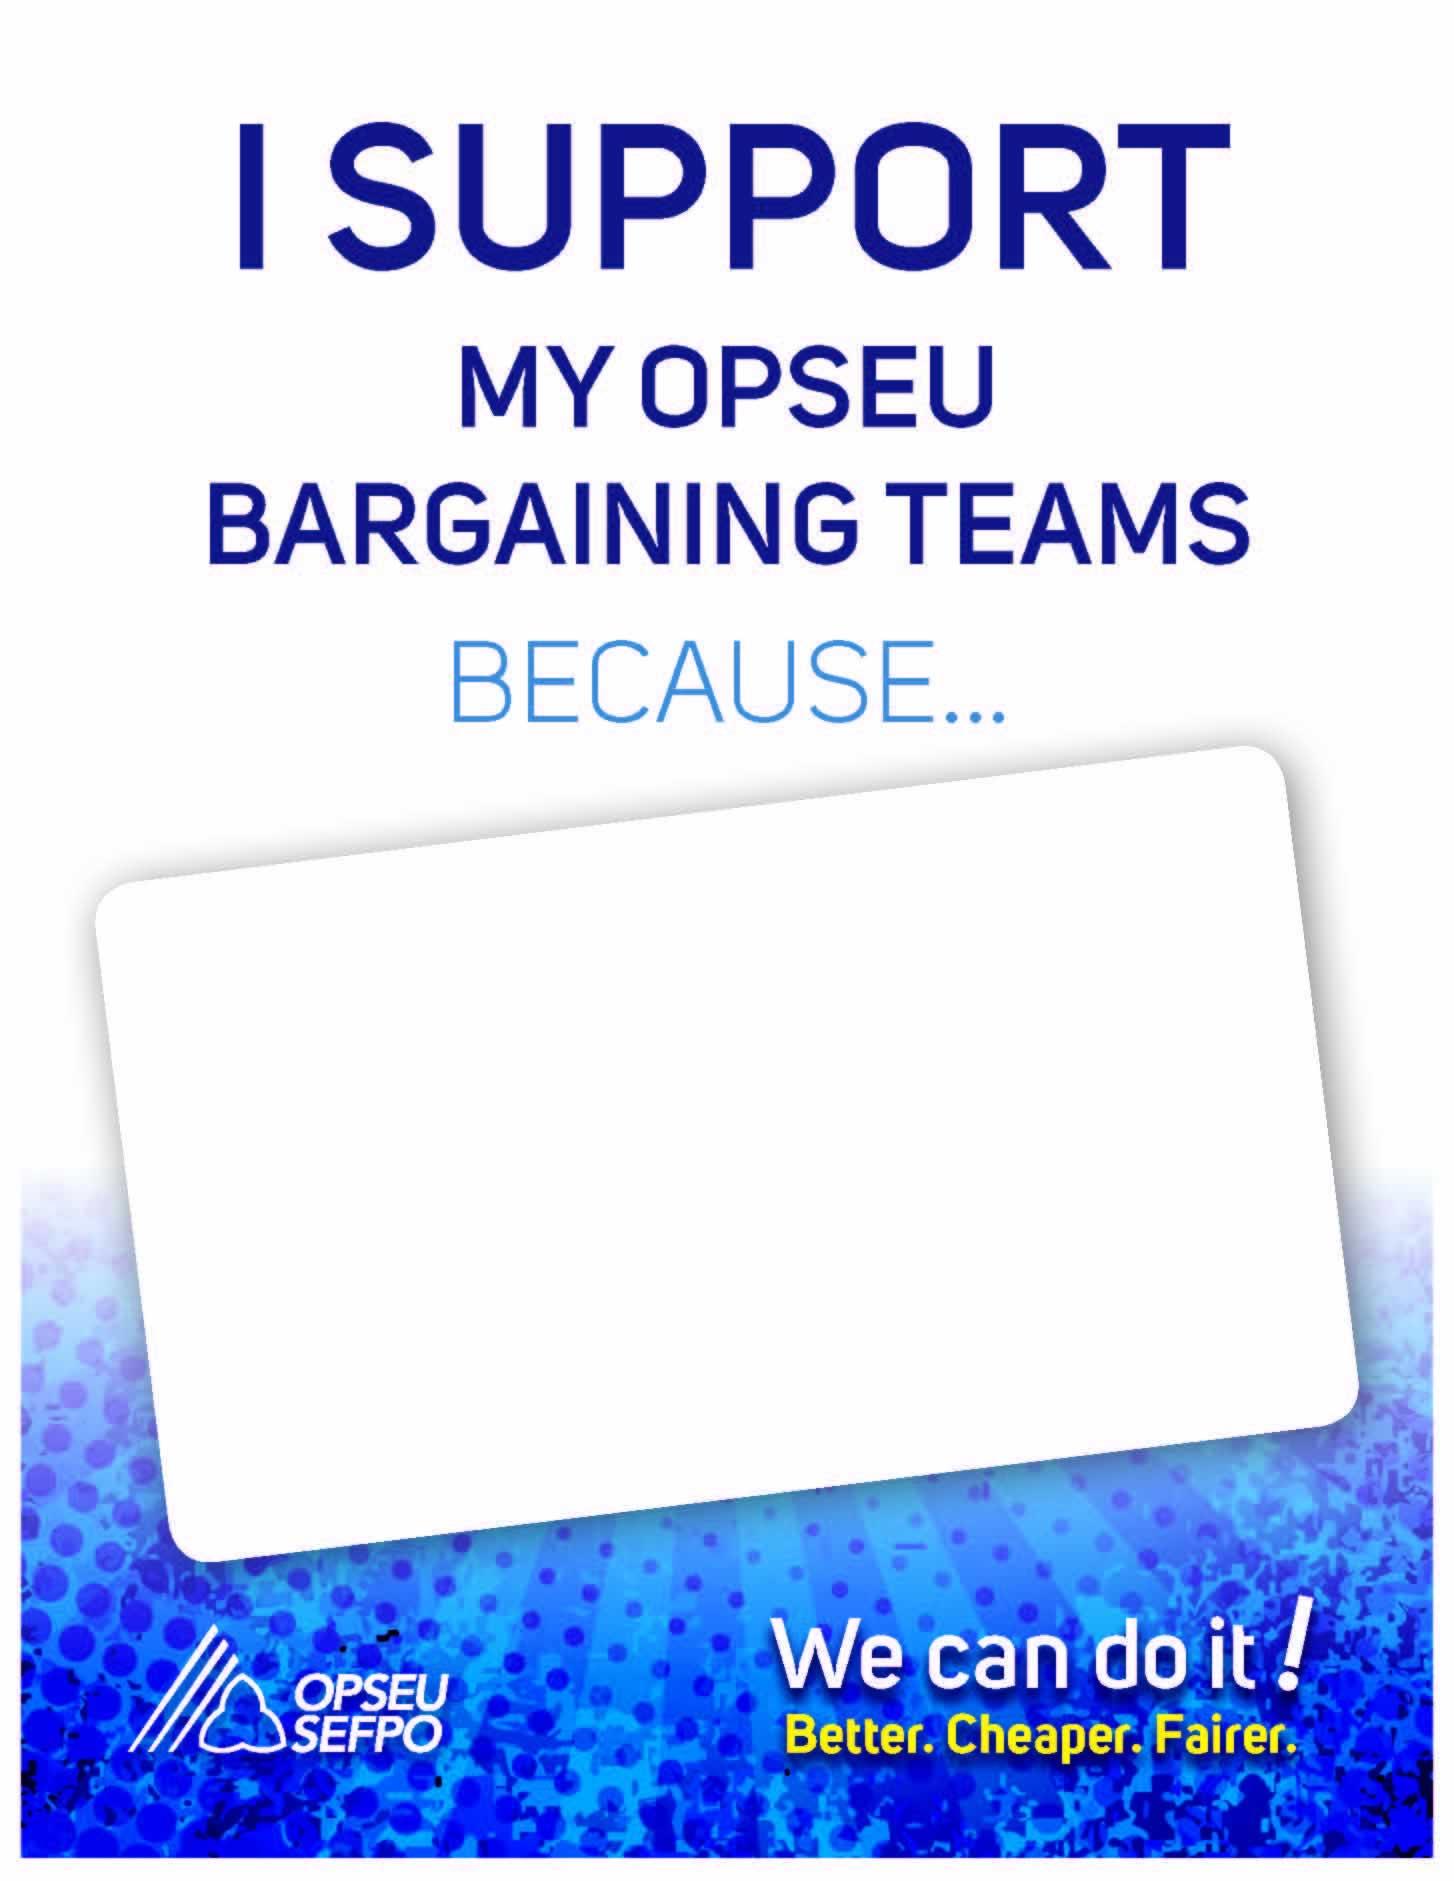 2015-02_ops_en_i_support_opseu_poster_c.jpg